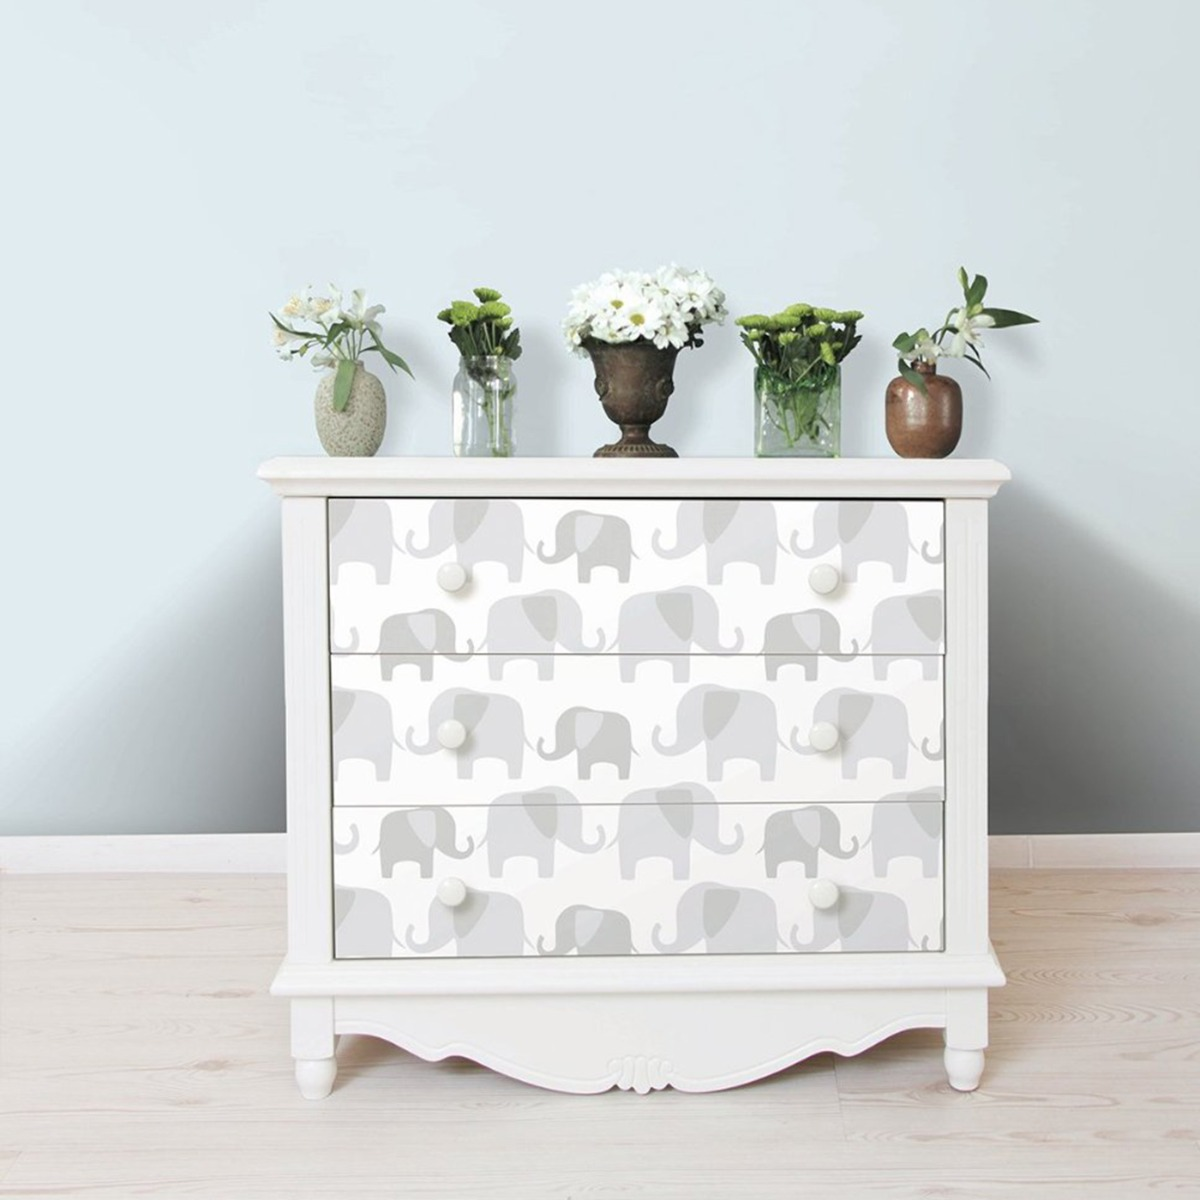 NuWallpaper Elephant Parade Peel And Stick Wallpaper Grey Fine Decor NU1405 5.5m x 0.52m